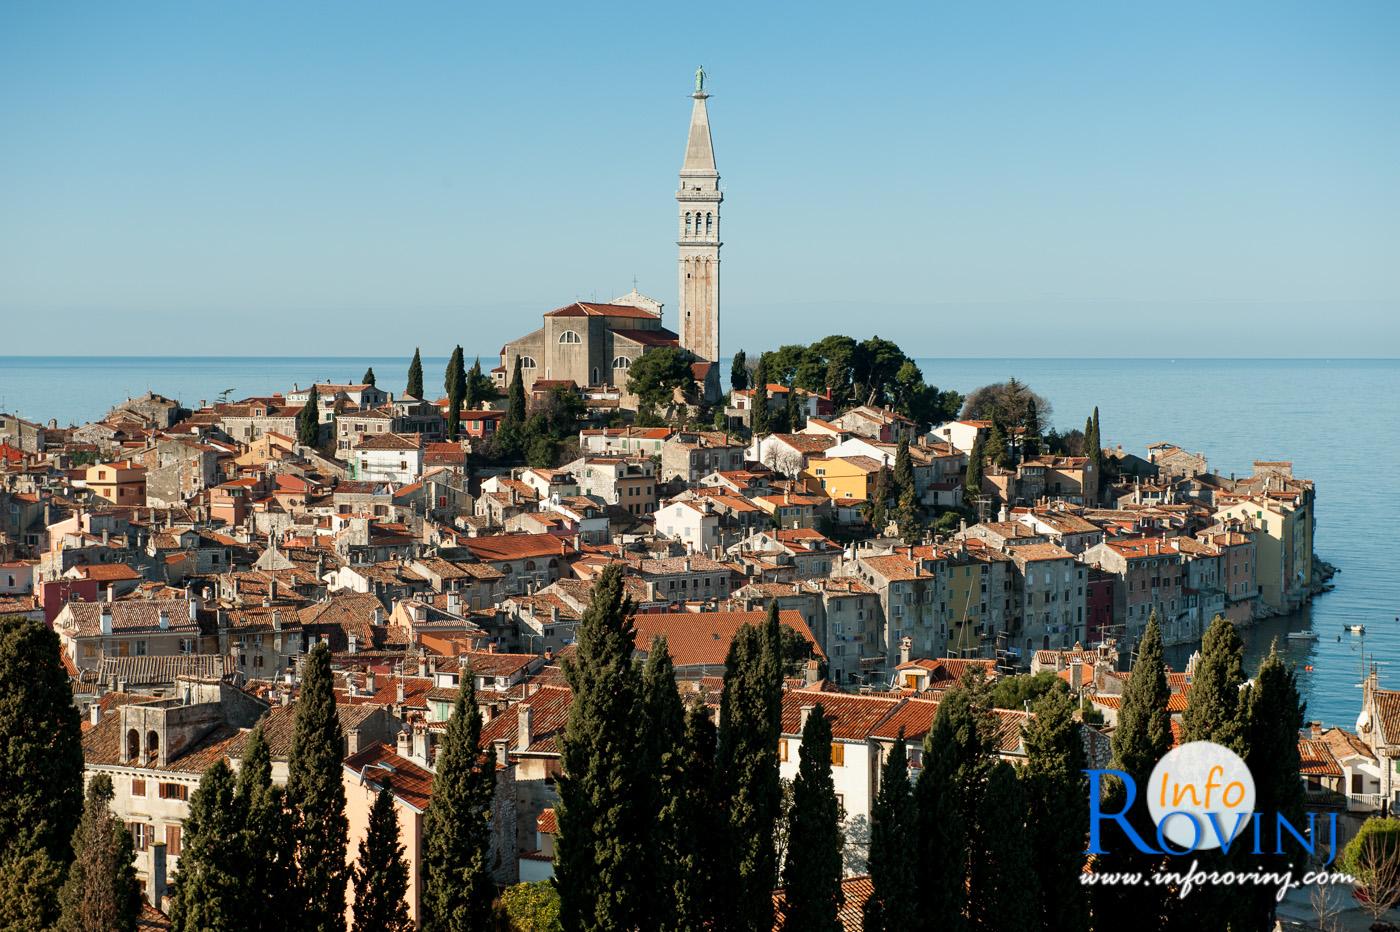 Rovinj has 14 294 inhabitants 2011 it is located on the western